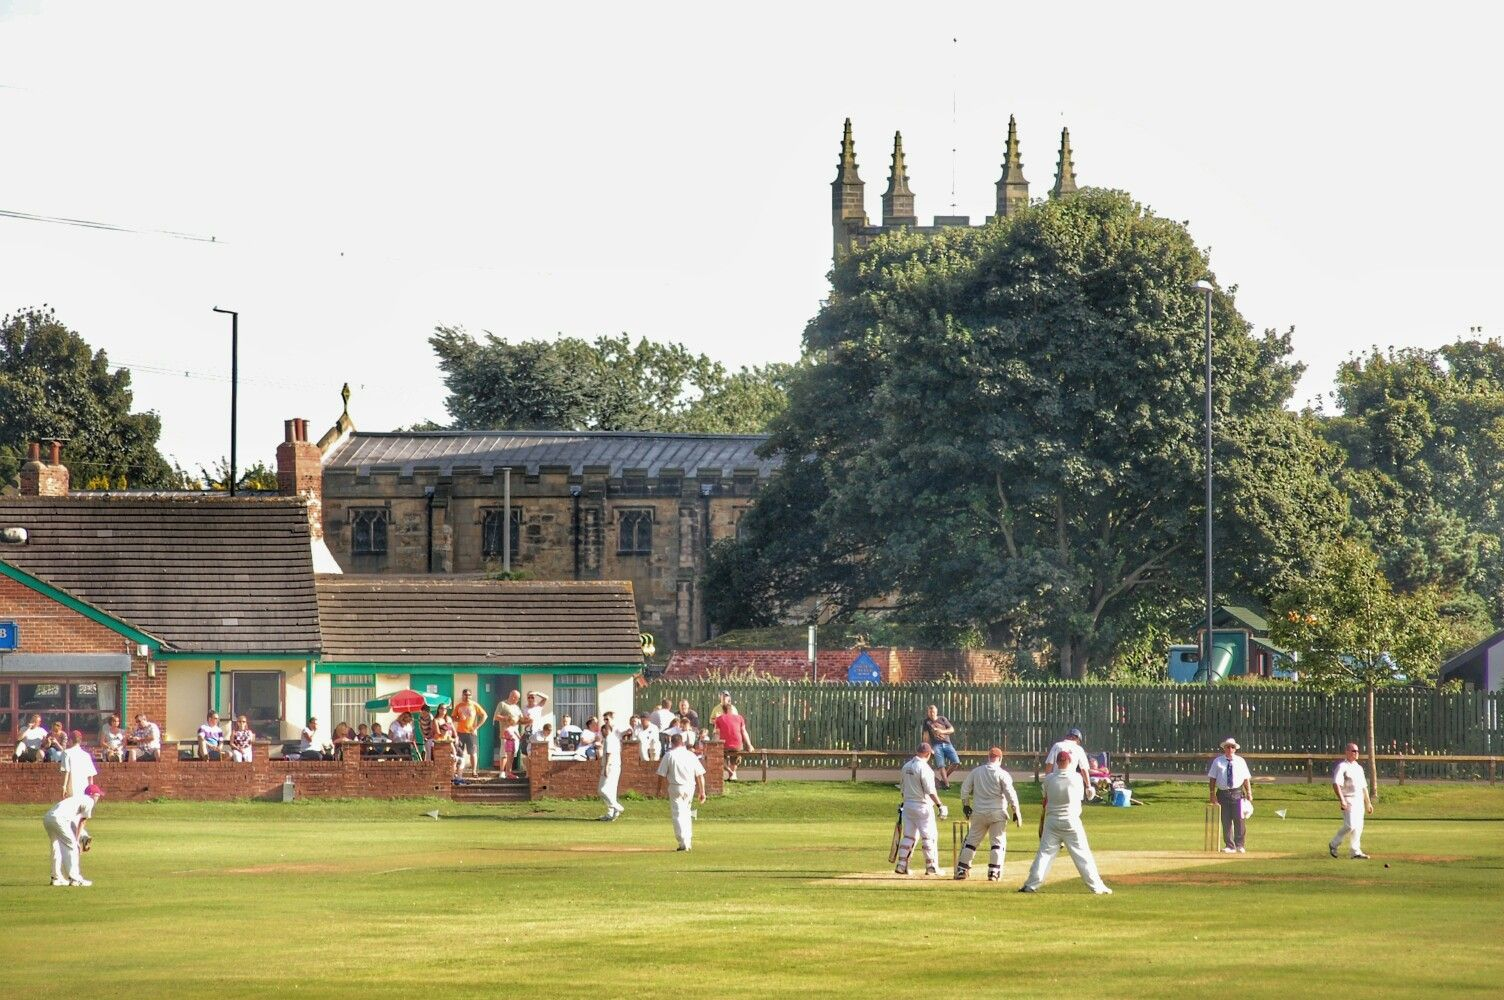 Methley Cricket Club Cricket Club Cricket Field